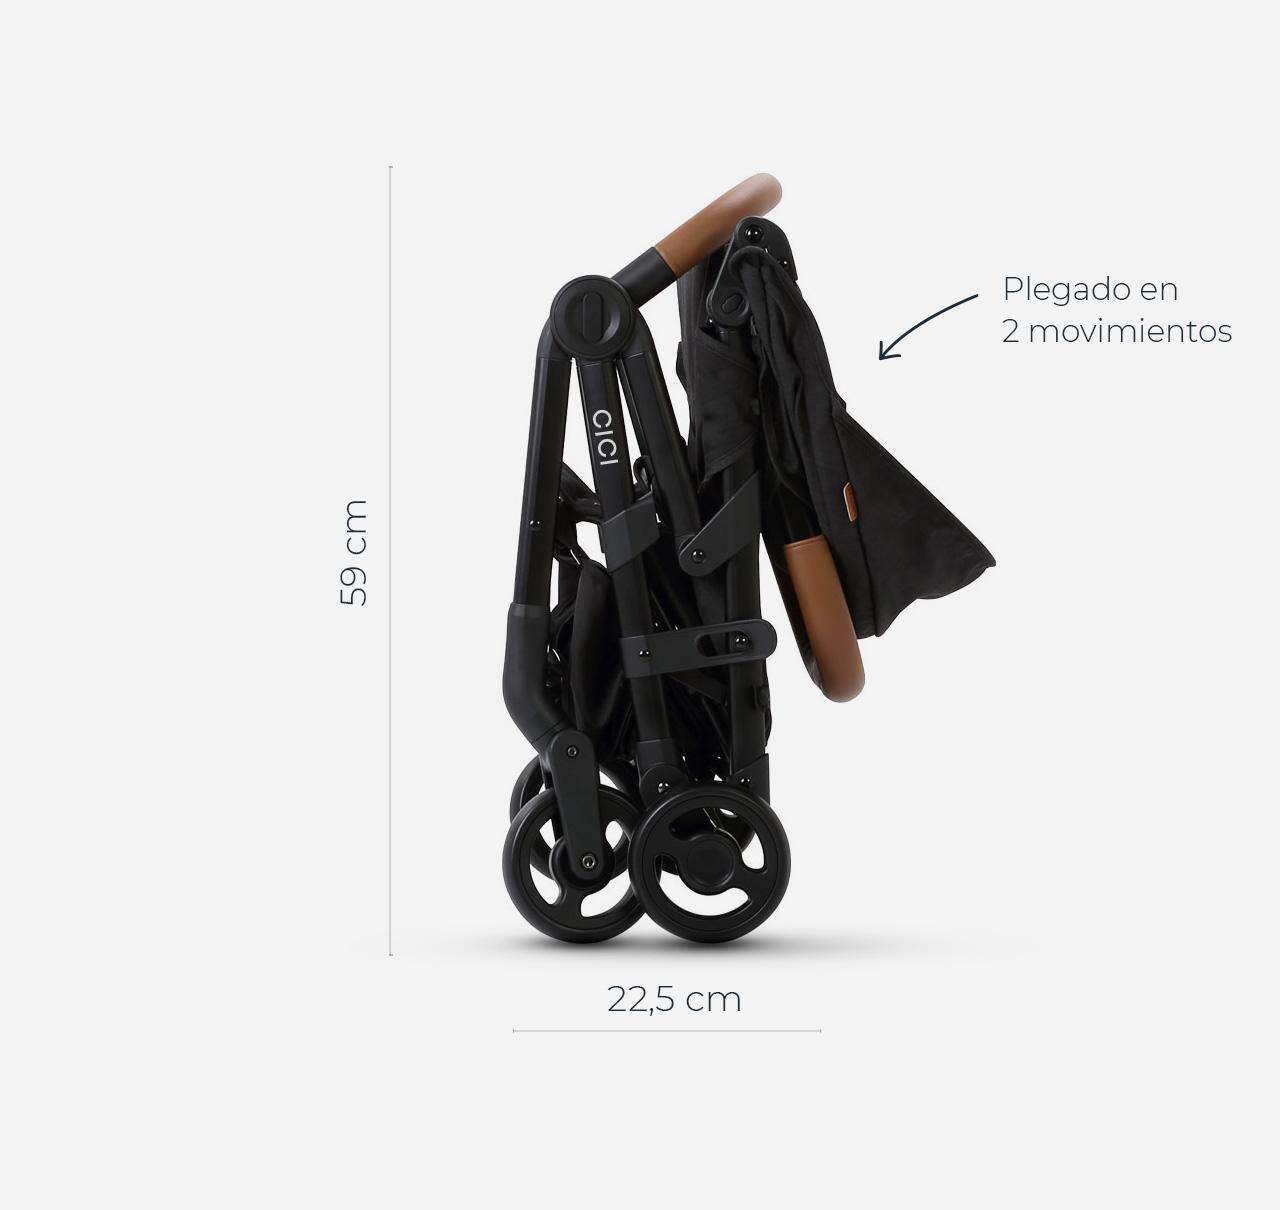 Cochecito CICI con Huevito Negro Melange imagen 9